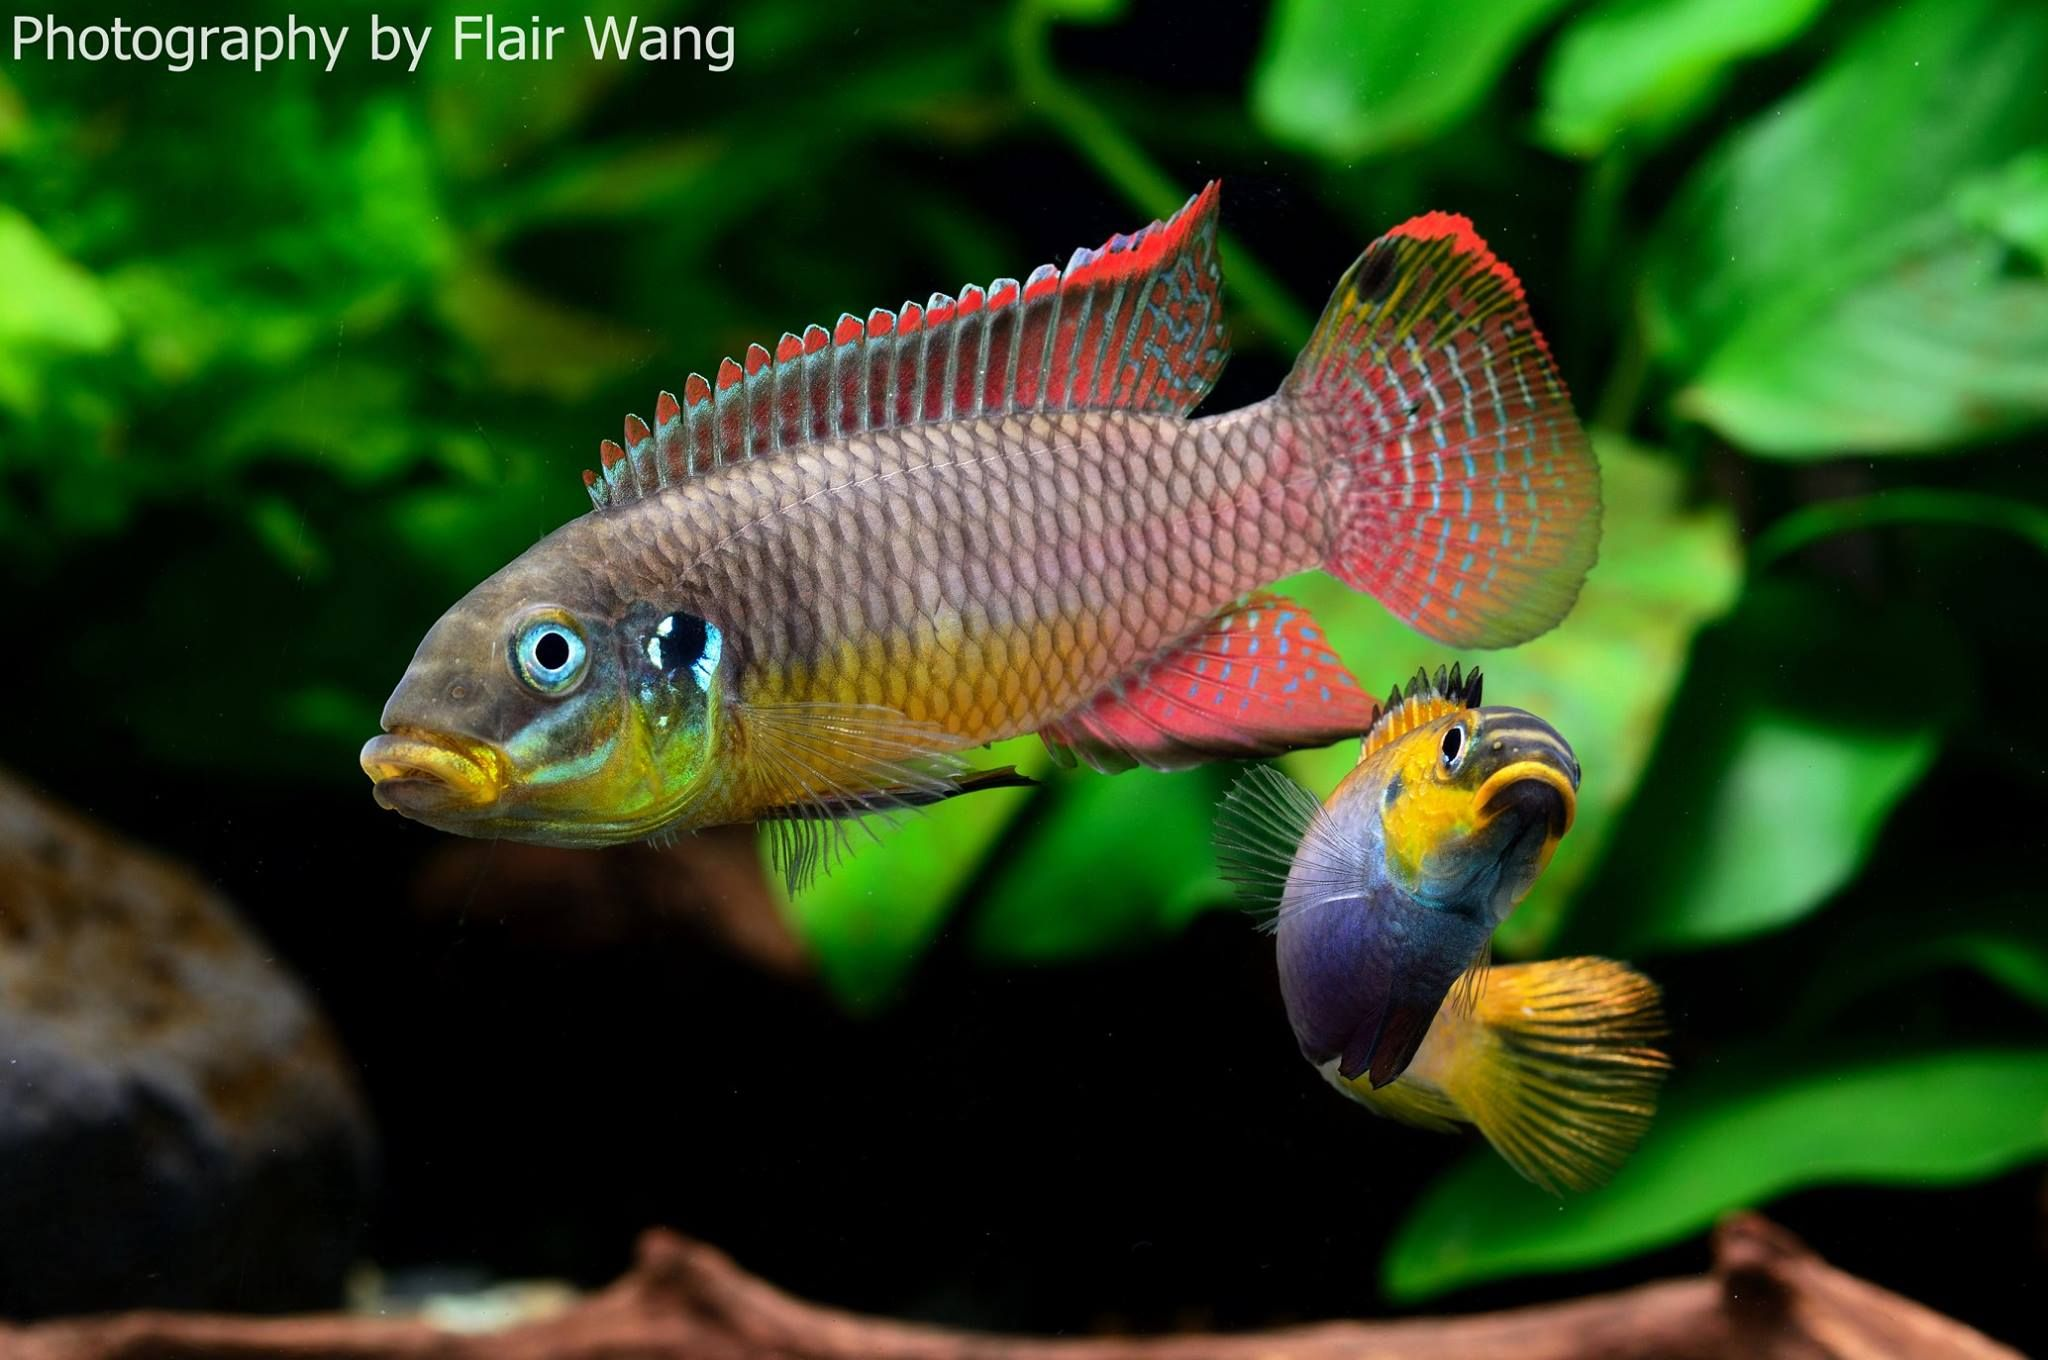 pelvicachromis taeniatus Texas dwarf Cichlid fiend